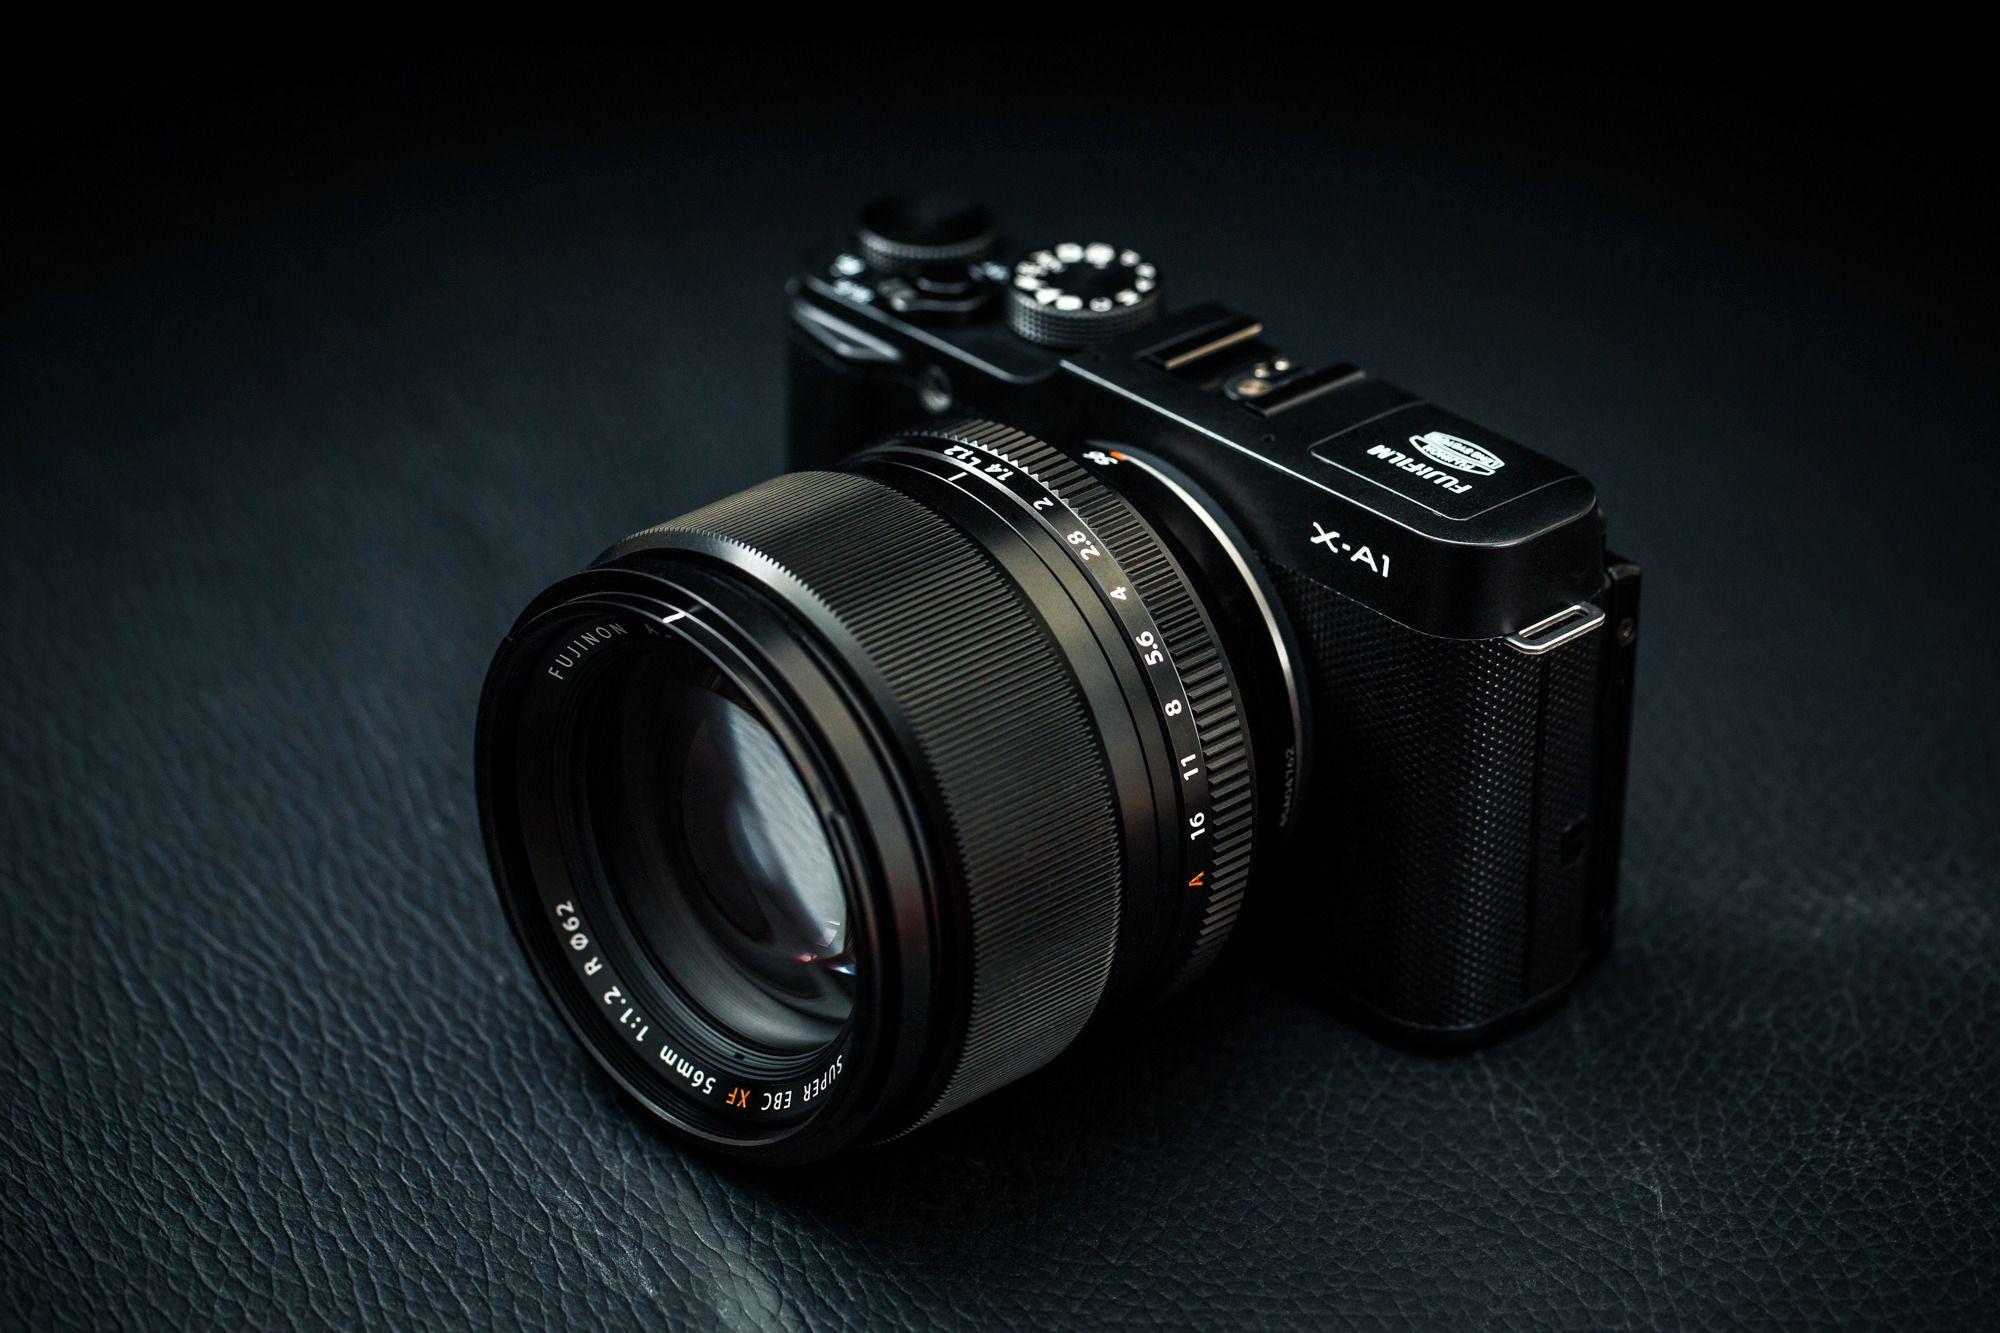 Fujifilm X-A1 med Fujinon XF 56mm f/1.2 R.Foto: Johannes Granseth